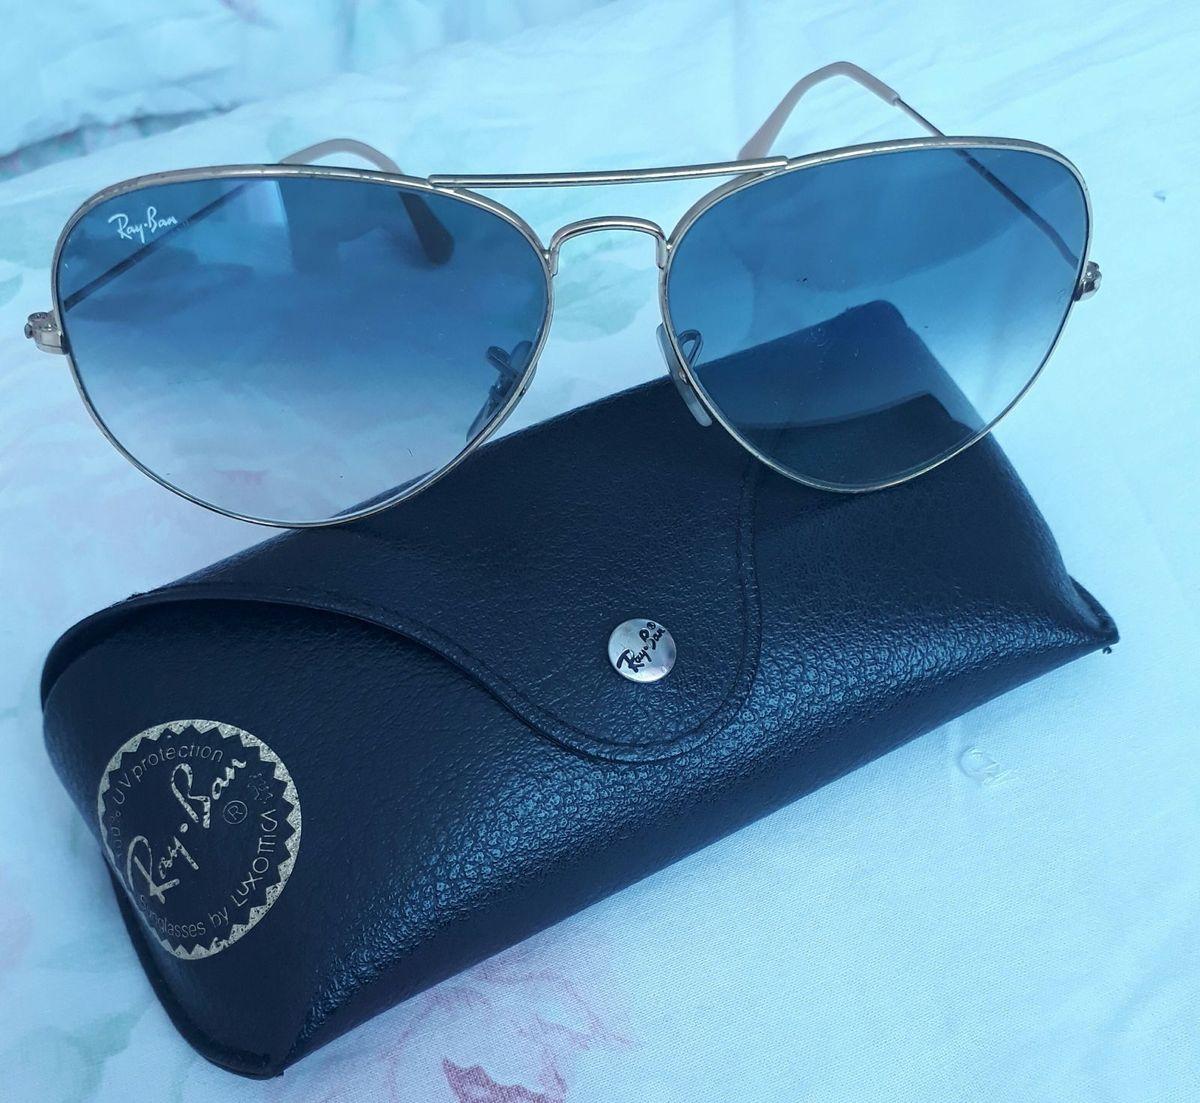 Oculos Ray Ban Aviator Azul Desgradê   Óculos Feminino Ray Ban Usado ... 443e744012